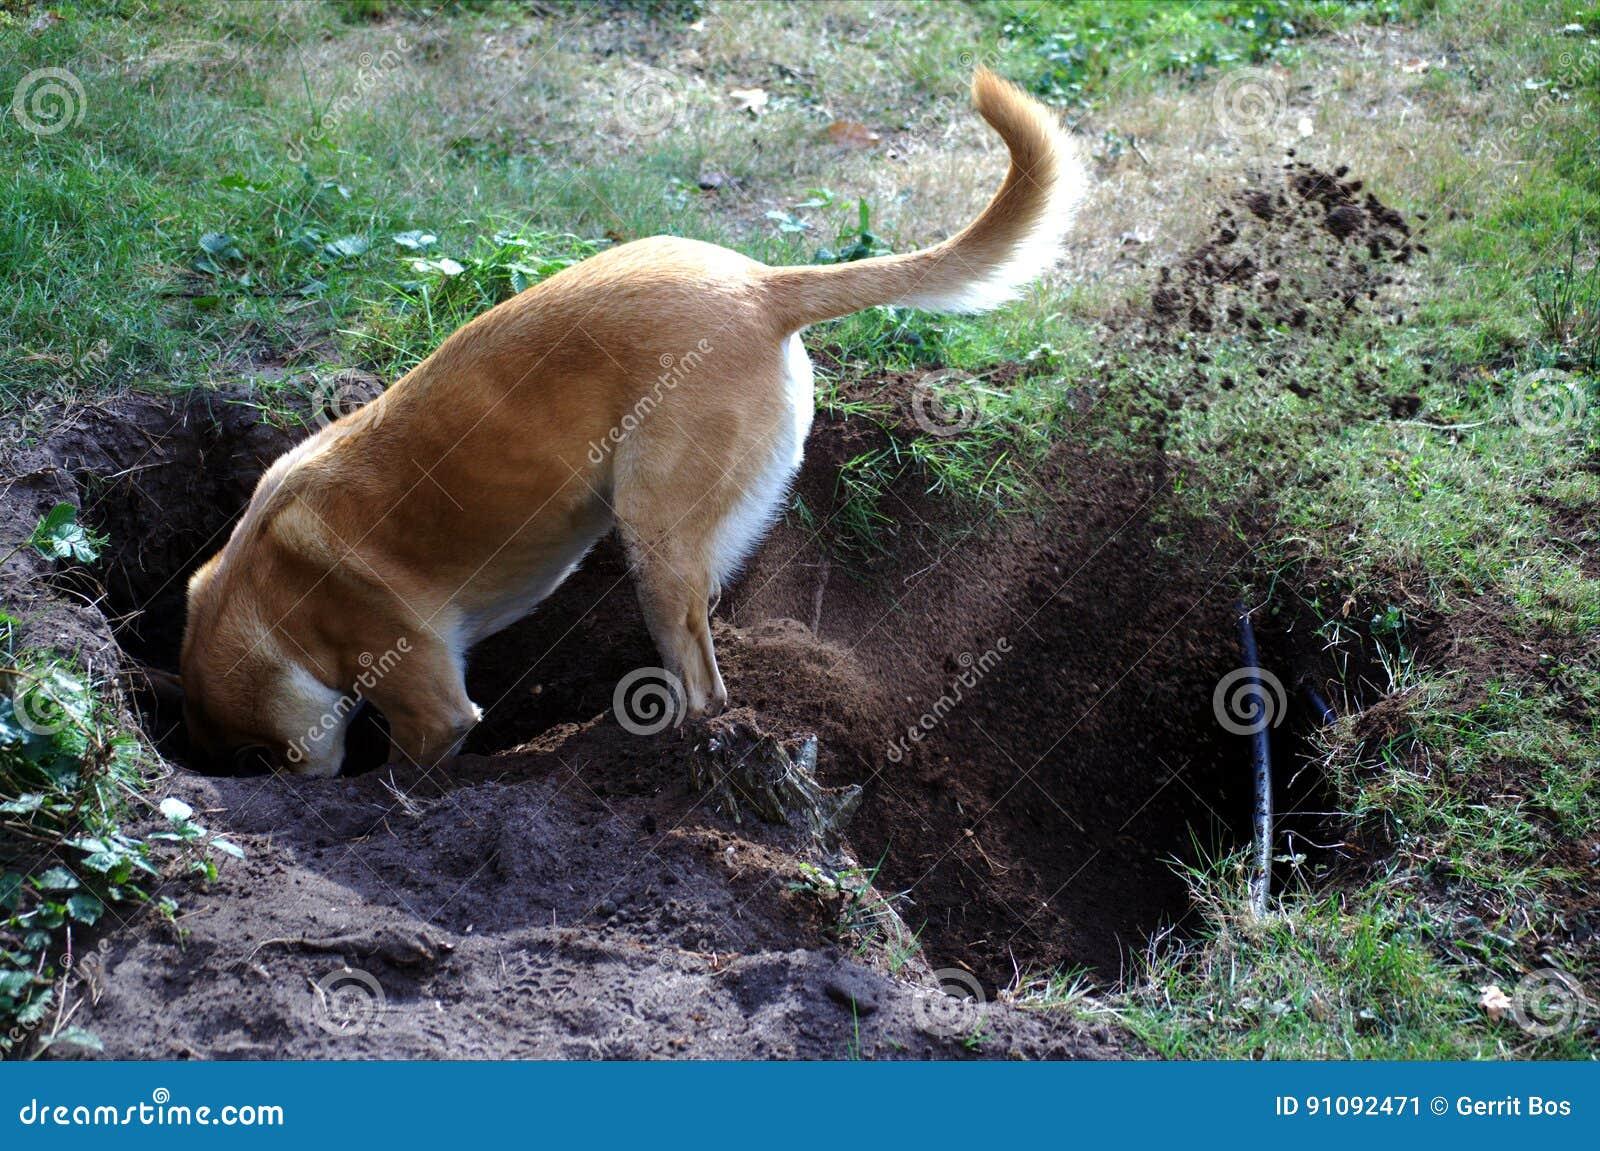 Belgian Malinois dog digging a hole